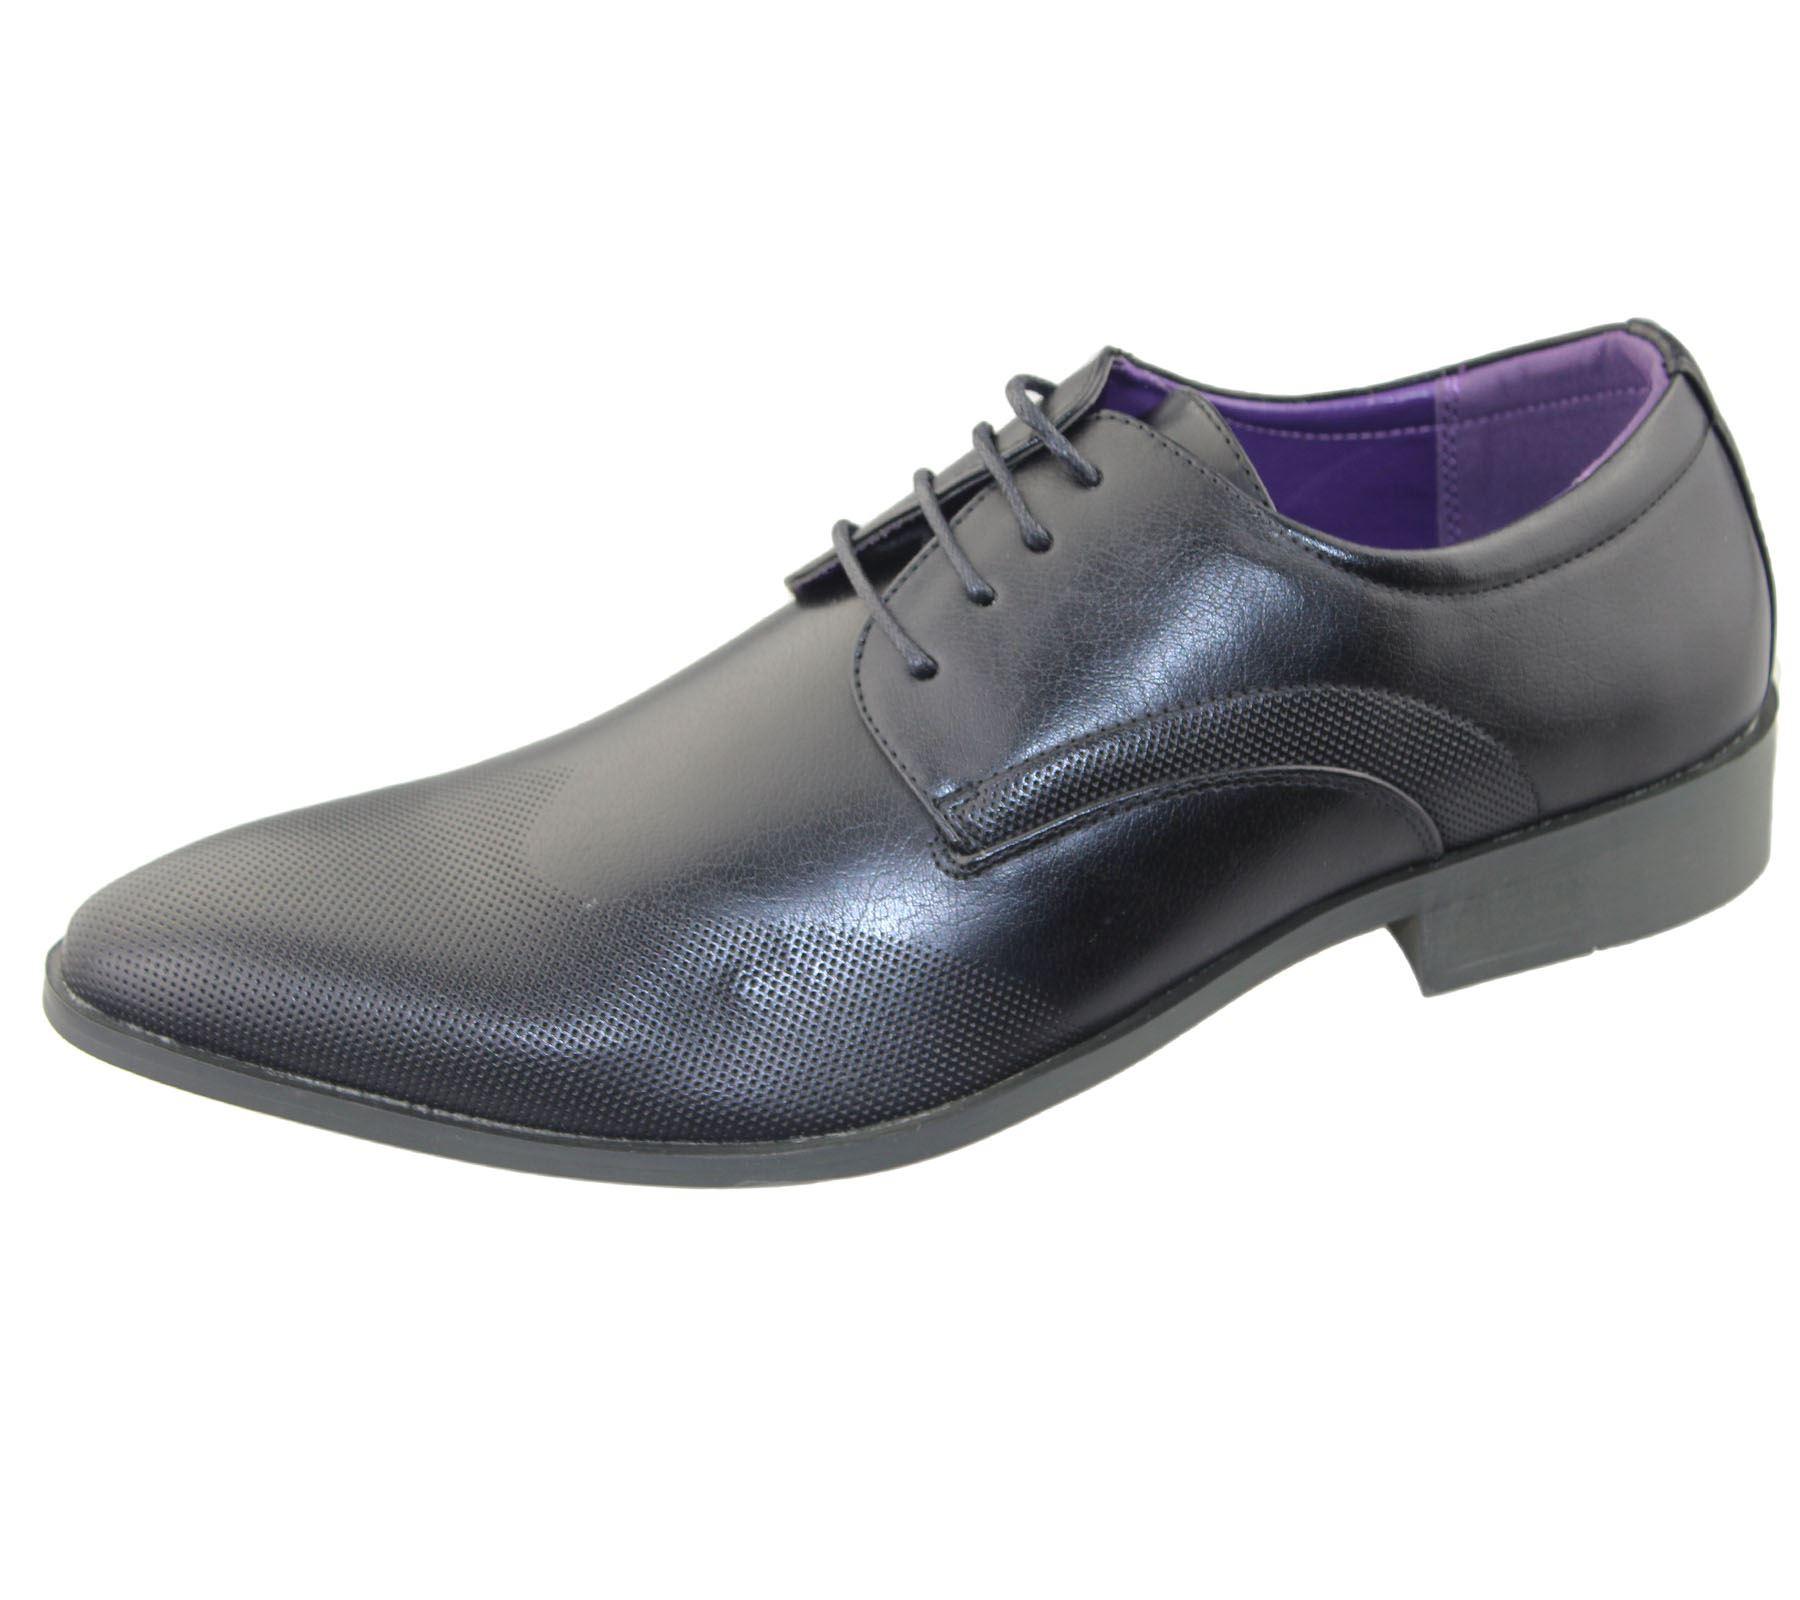 Casual Wedding Shoes 031 - Casual Wedding Shoes